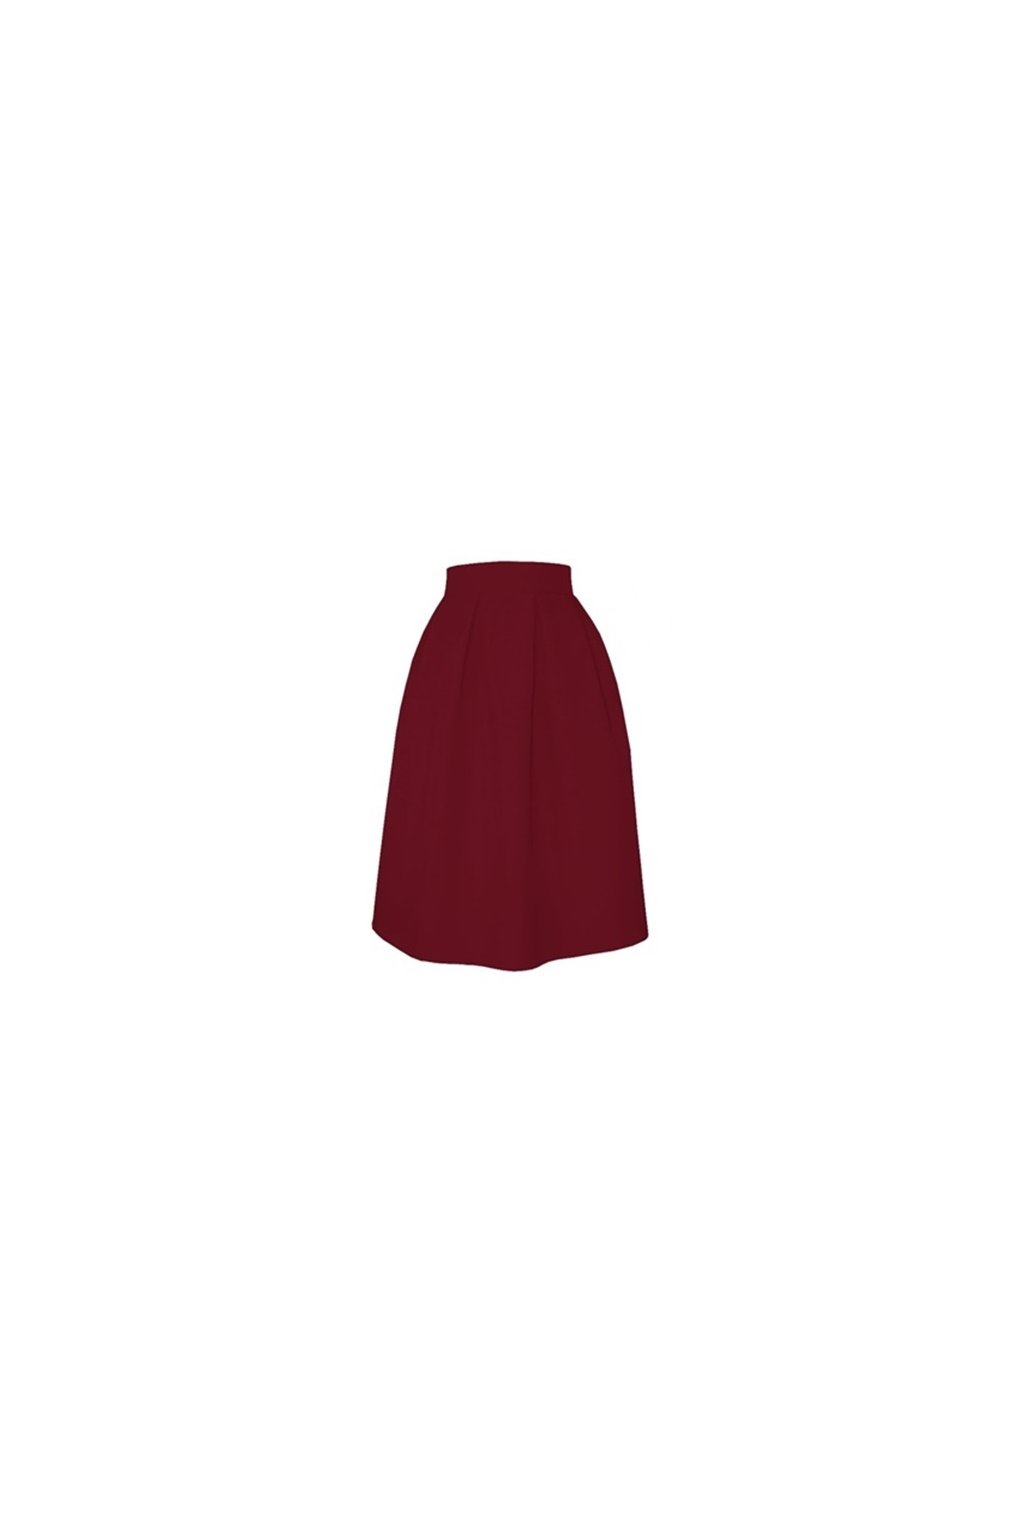 17862790d446 Áčková sukňa s protizáhybmi bordová - Tentation.sk